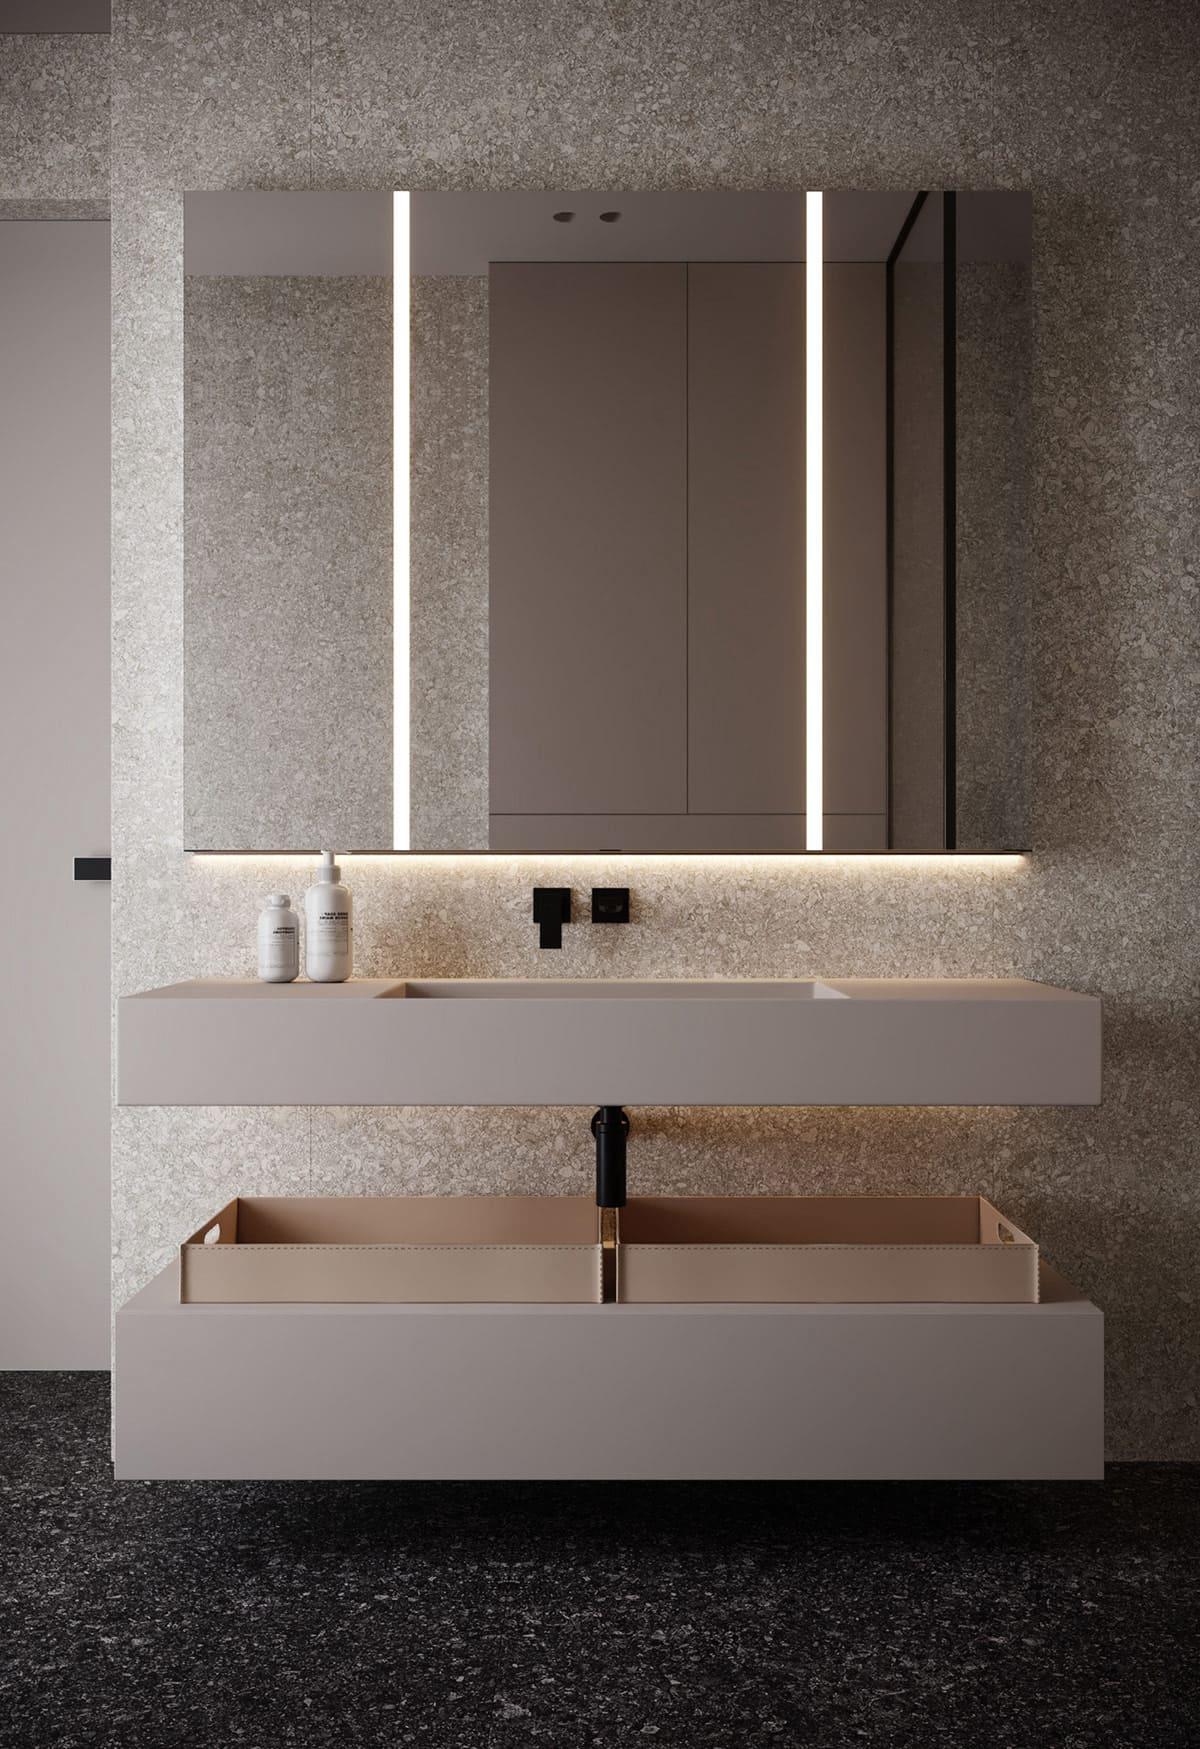 дизайн интерьера модной квартиры фото 9